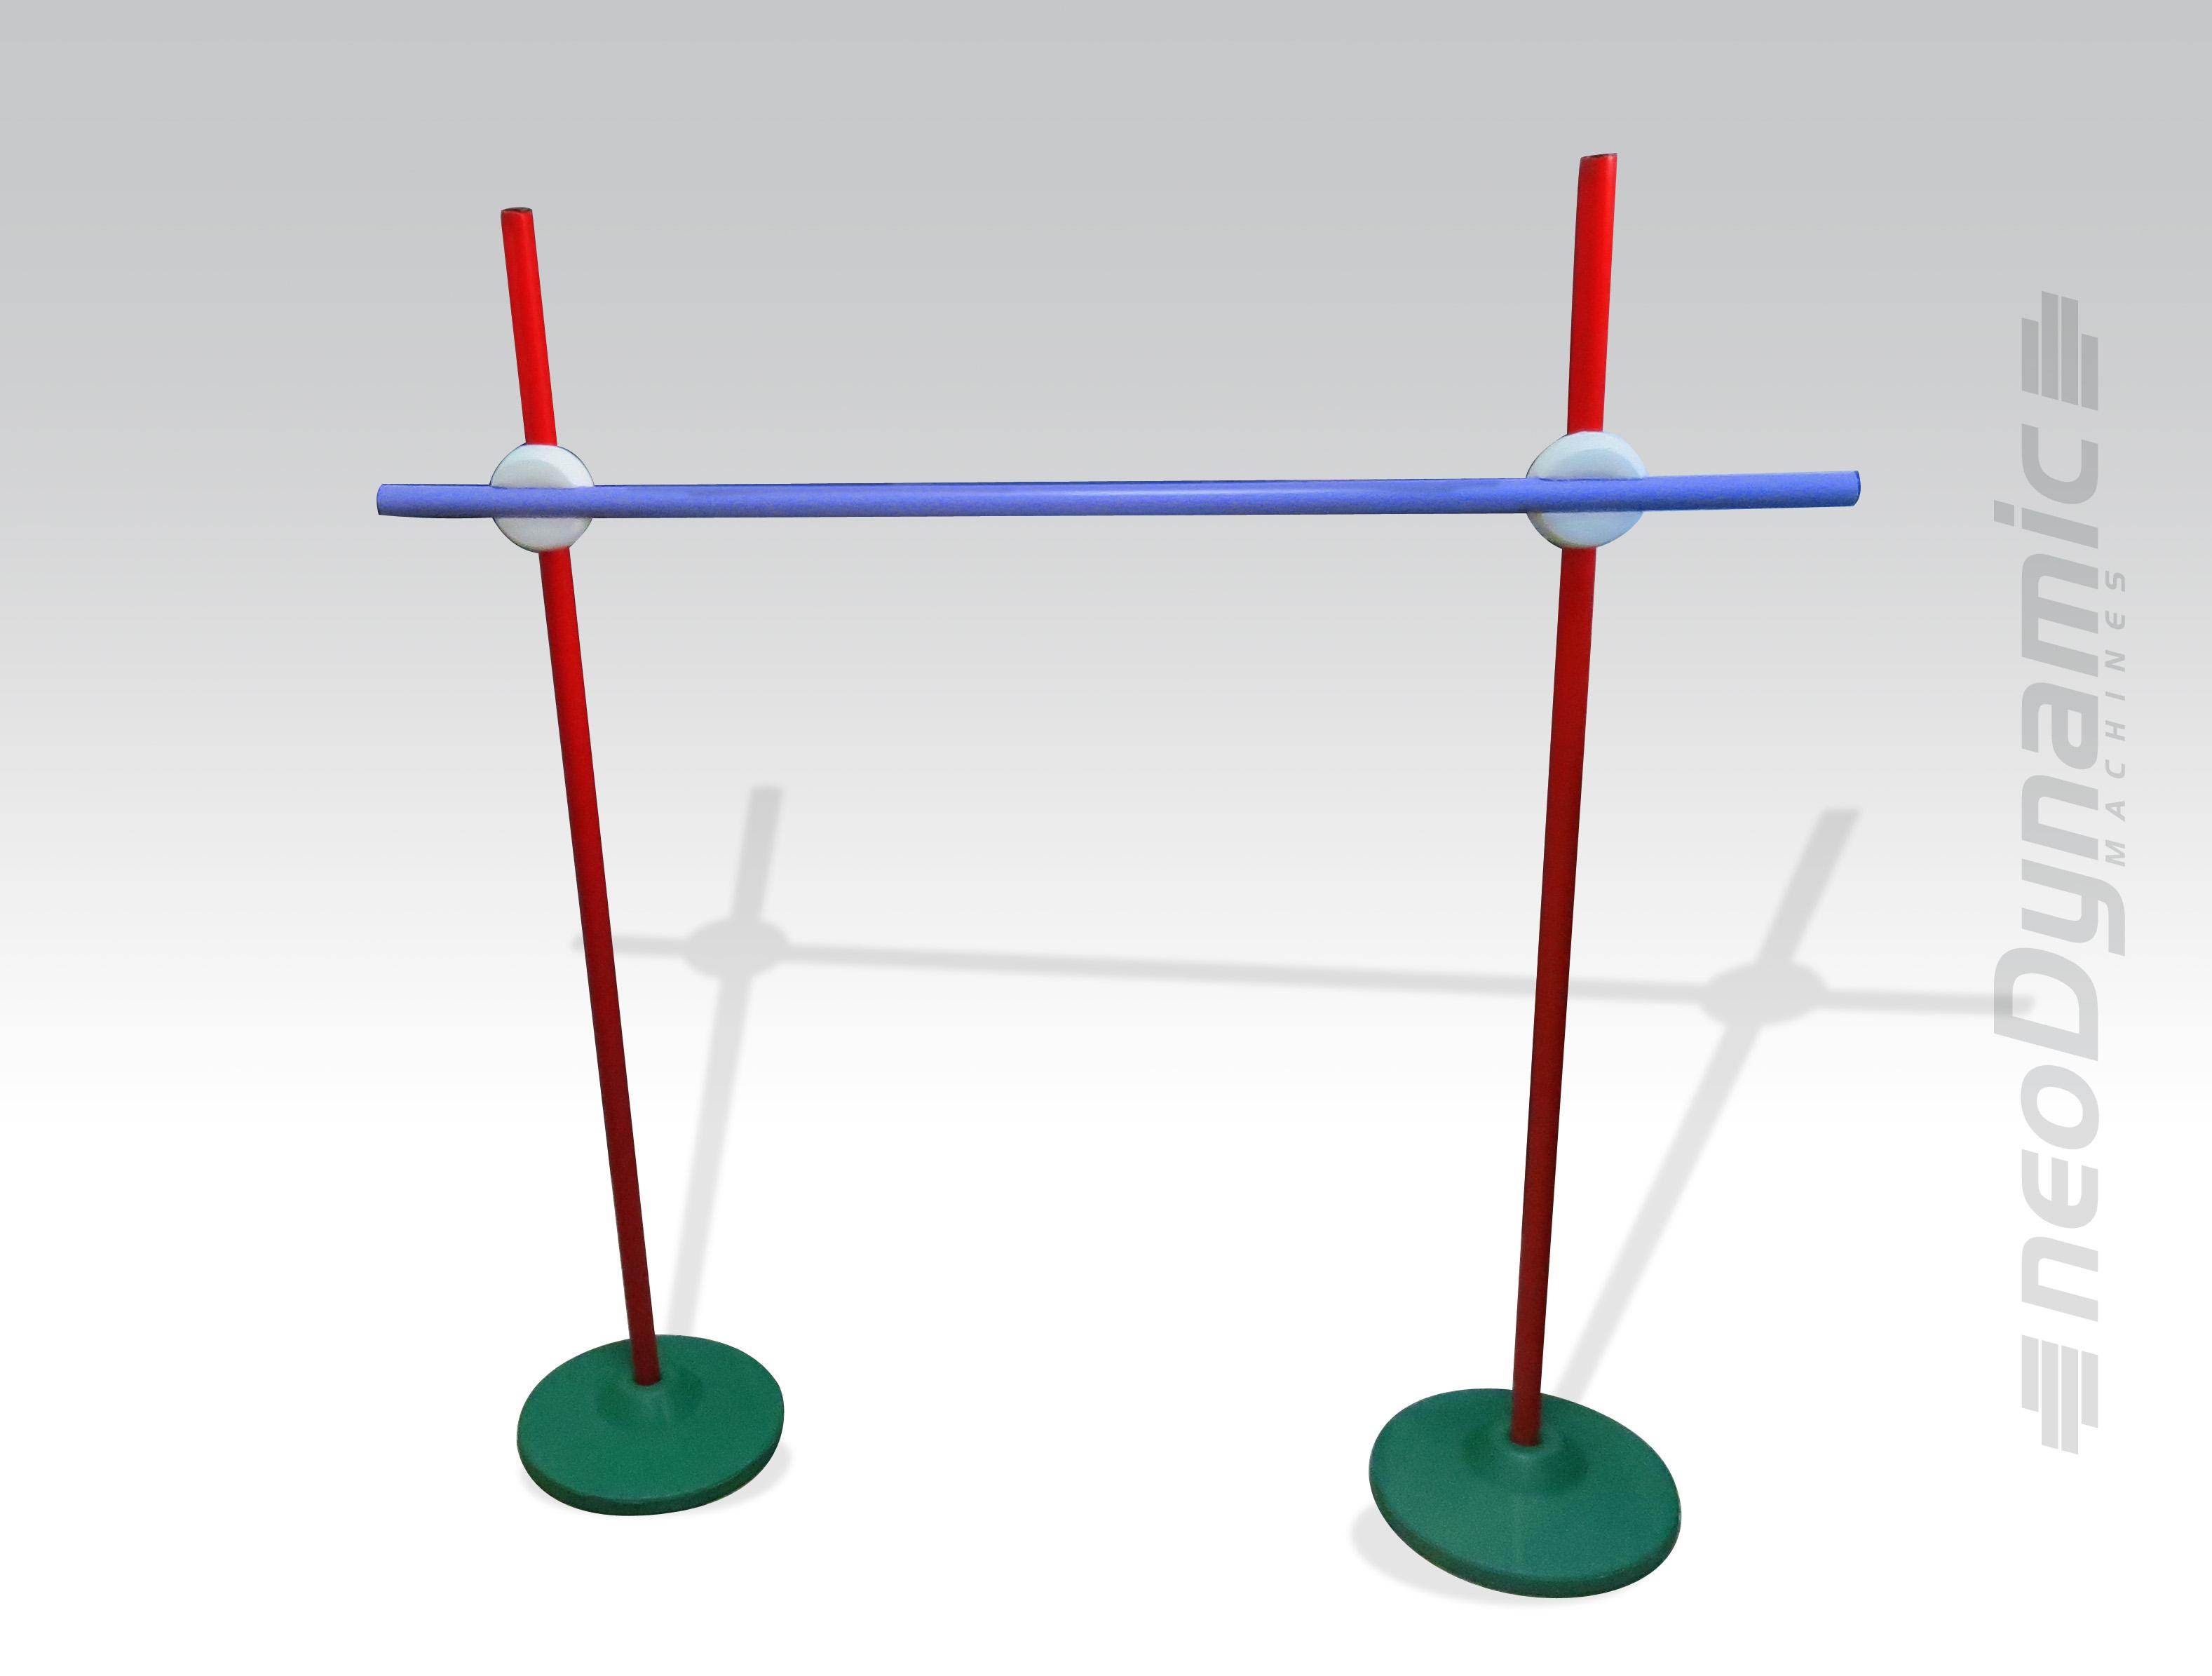 300x100x10cm Triclicks Gimnasia para el Gimnasio Gimn/ástico//Yoga//Taekwondo//Agua